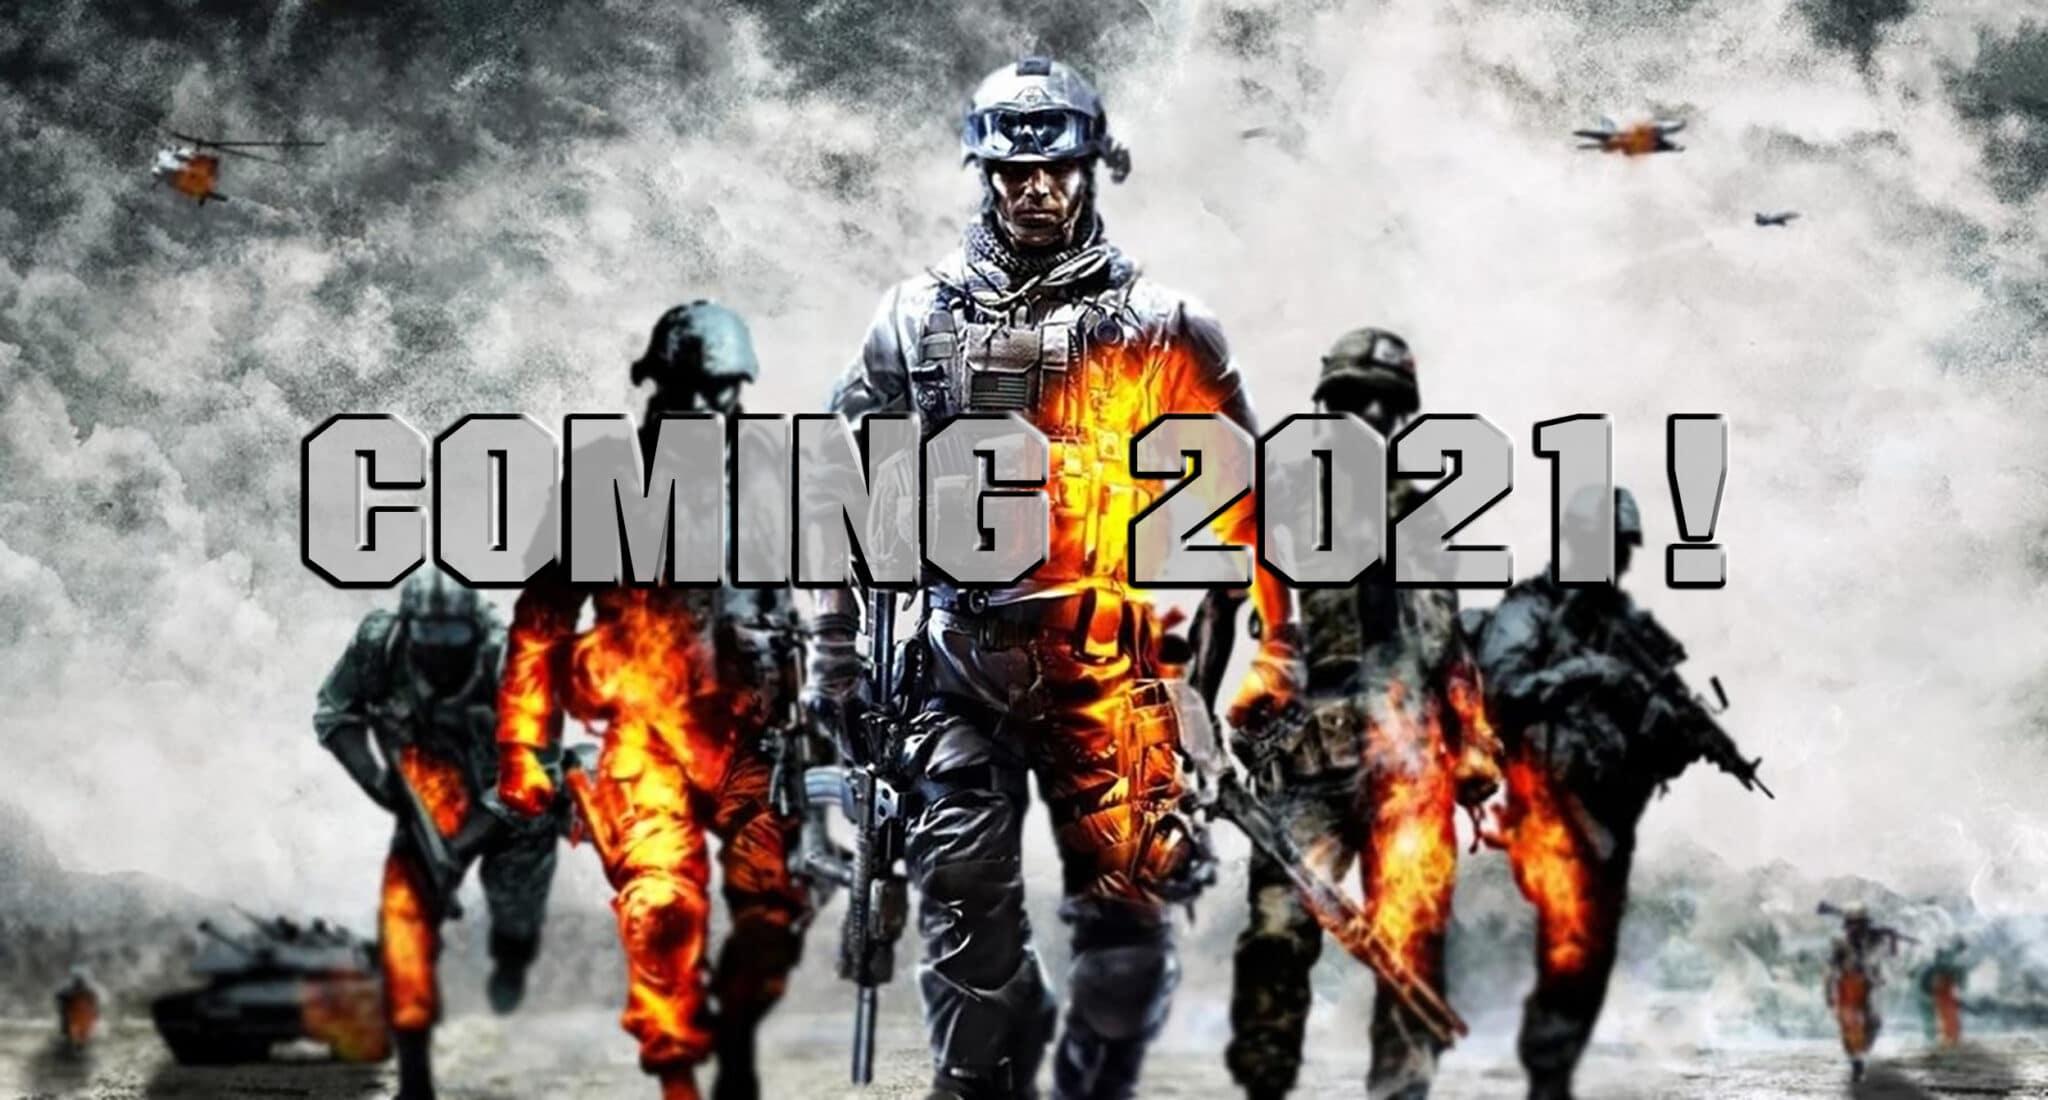 Electronic Arts Confirms Next-Gen Battlefield Game Release Schedule